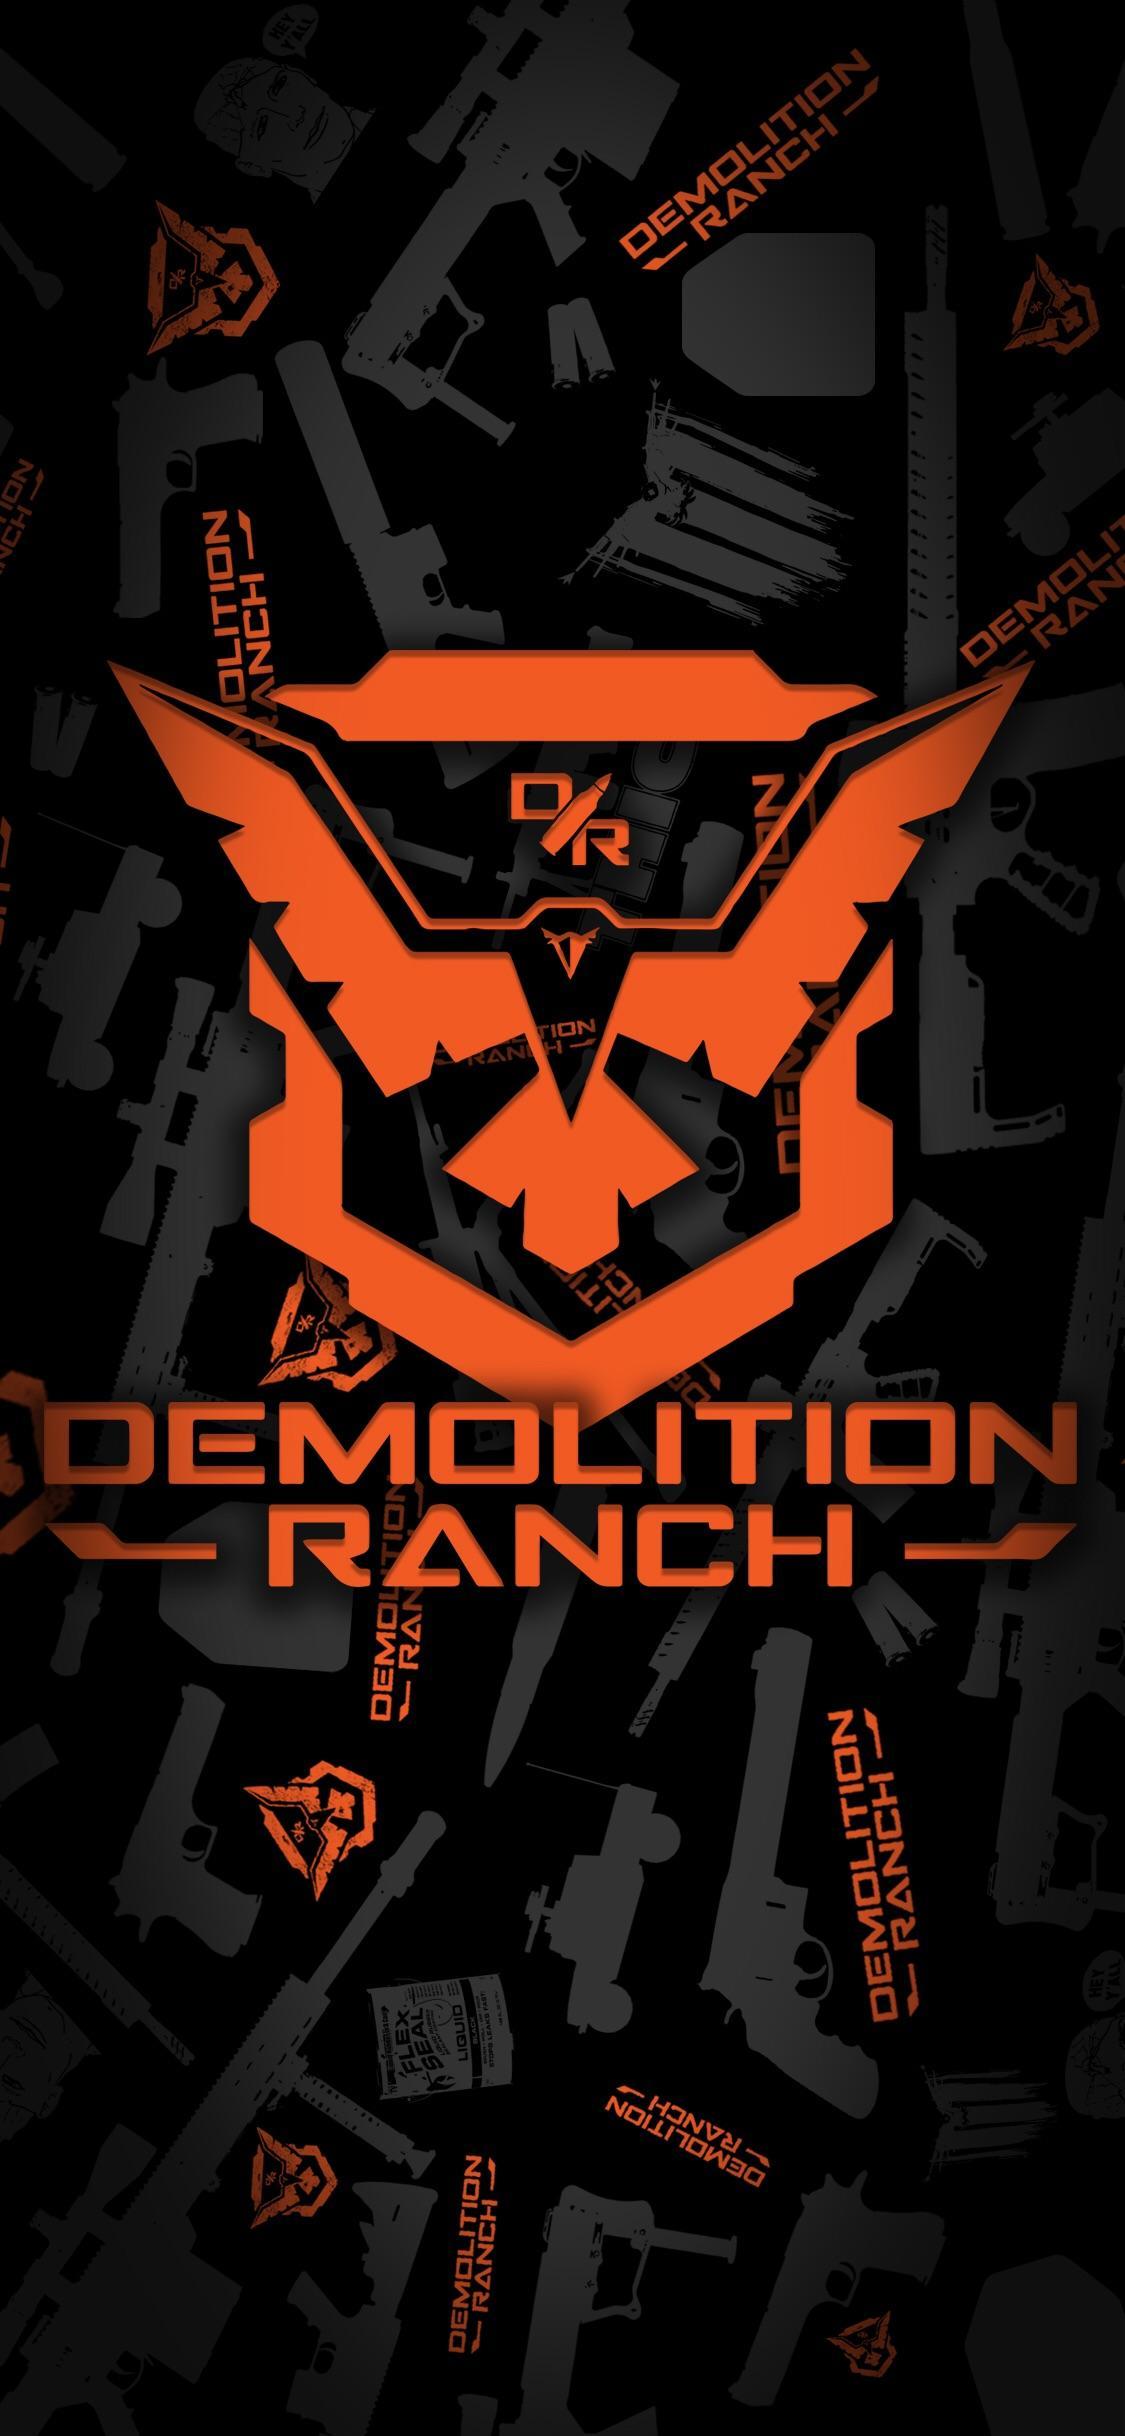 iPhone X wallpaper that I did make. : demolitionranch.